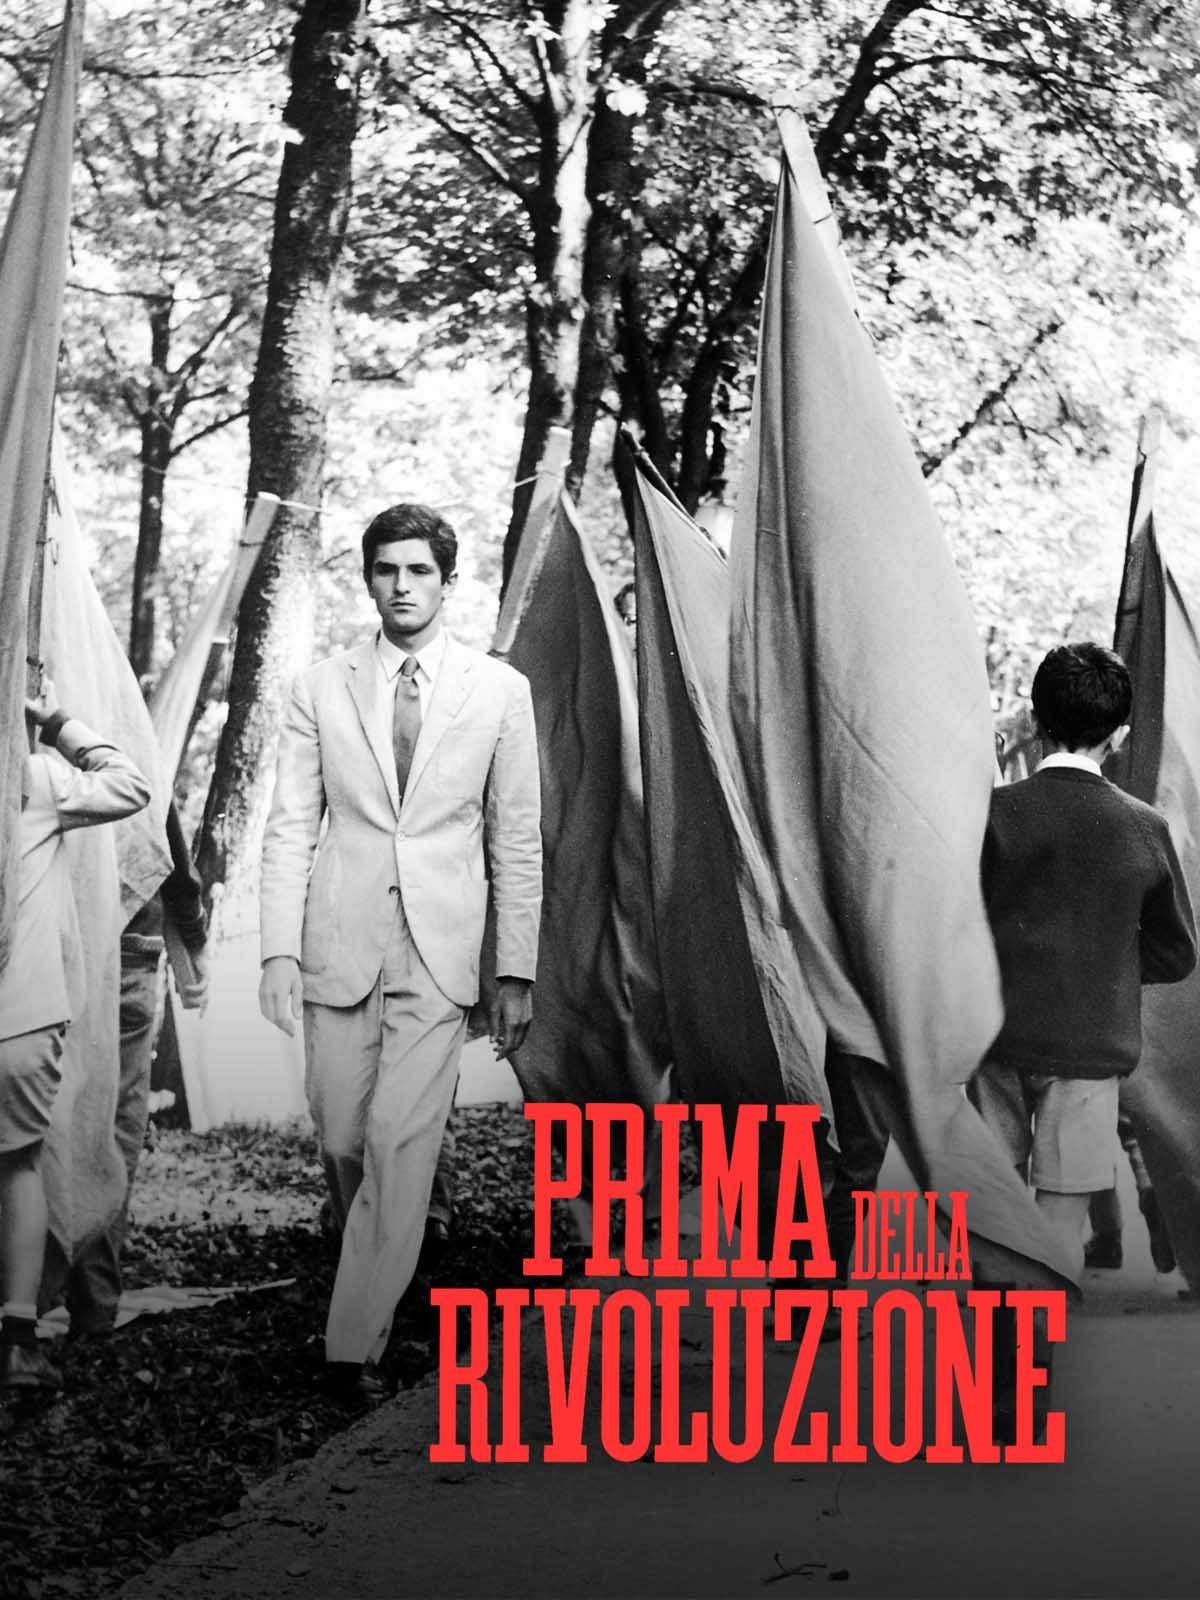 Before the revolution on Amazon Prime Video UK